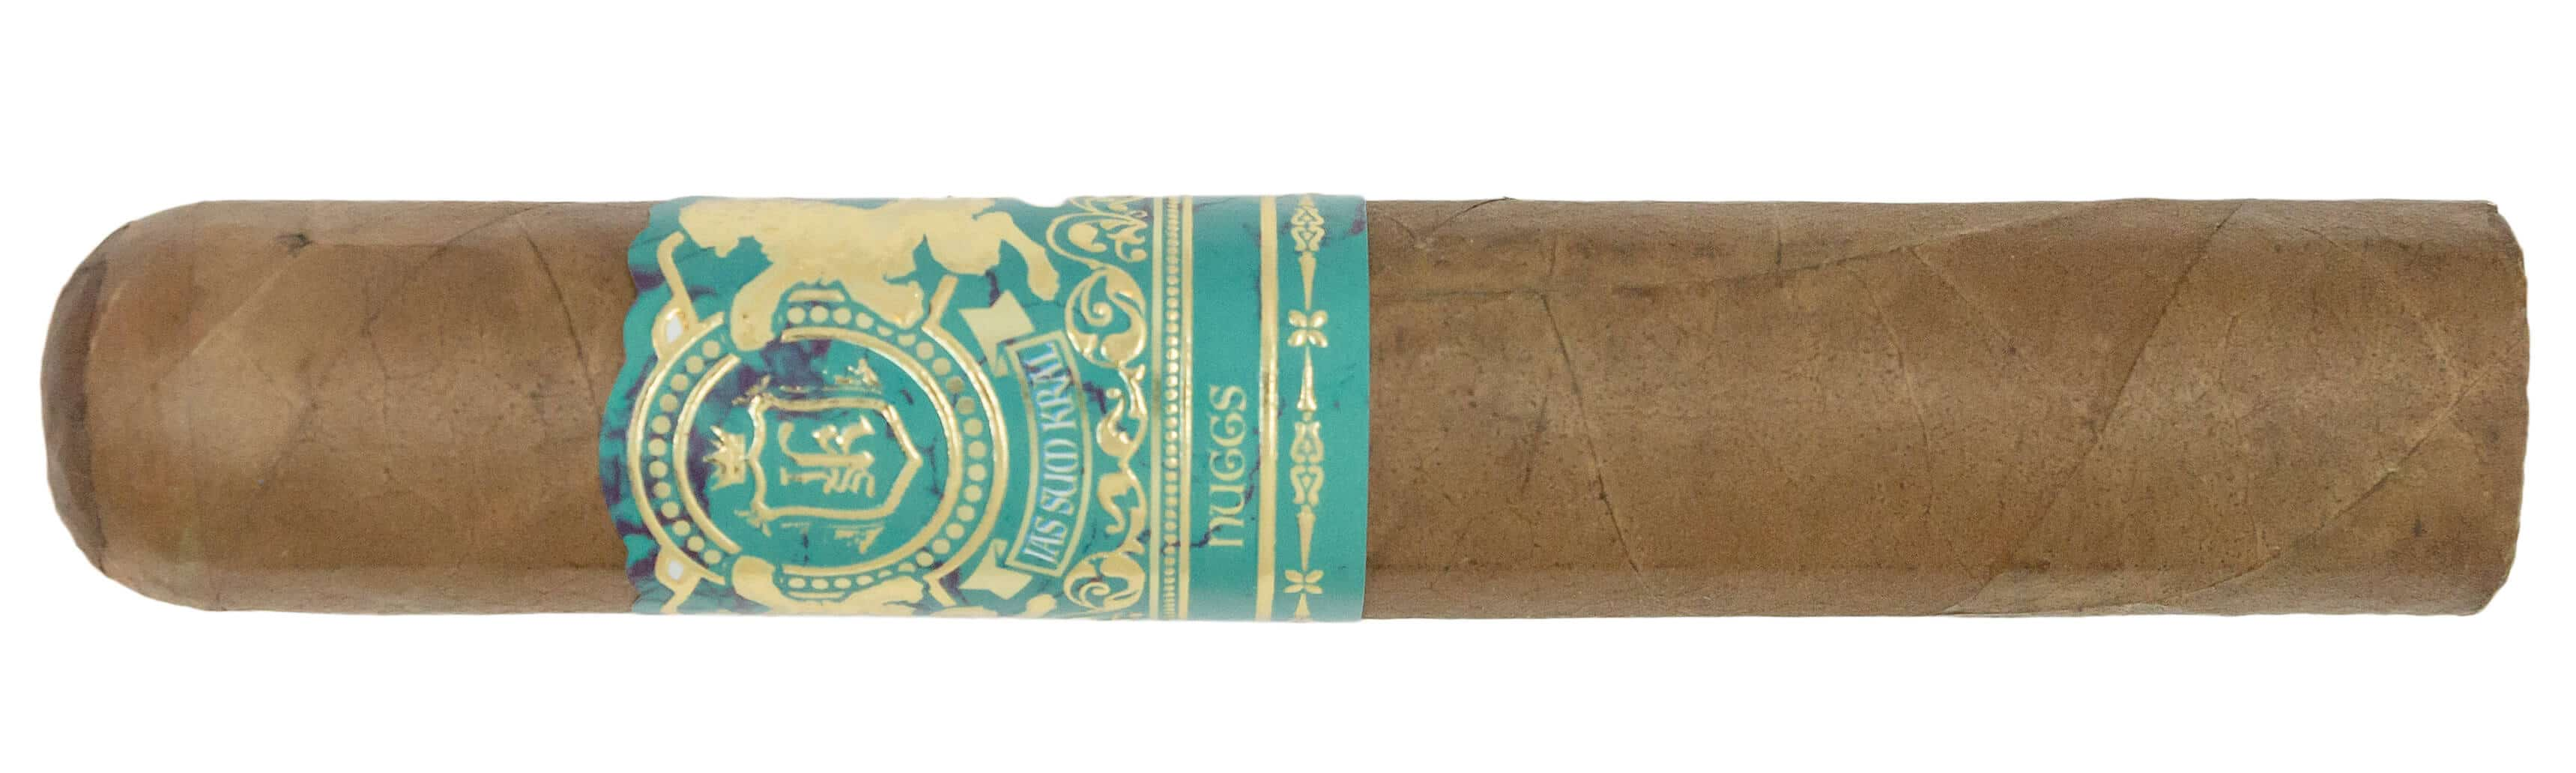 Cigar News: Jas Sum Kral Announces New Nuggs Size for TPE